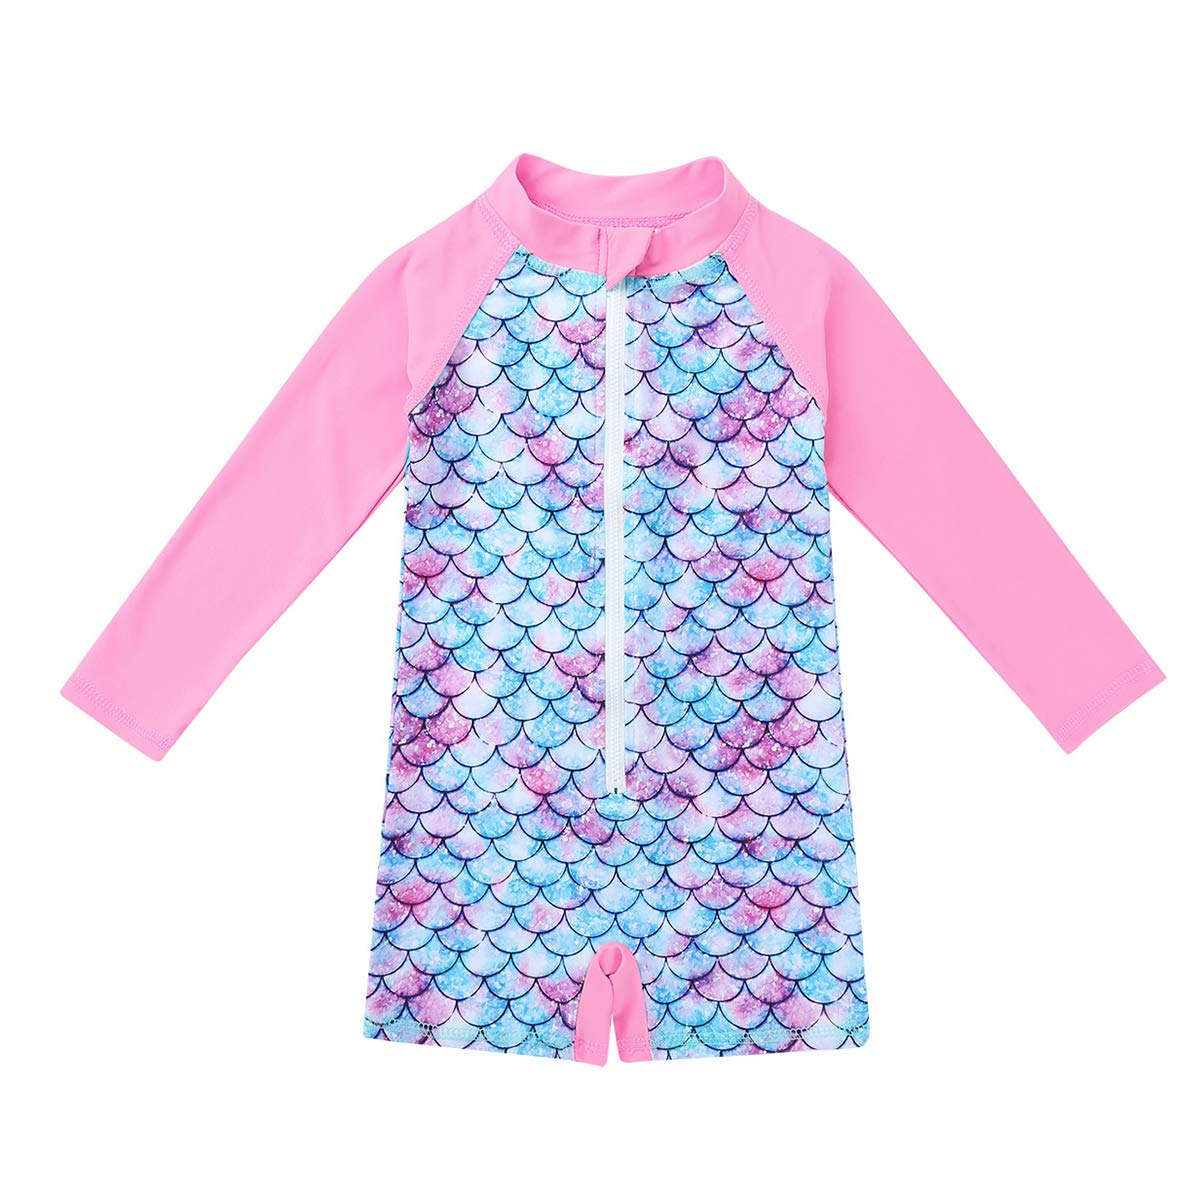 YOOJIA Kids Girls 2PCS Tankini Long Sleeves Mermaid Rashguard Swimsuit Swimwear Bathing Suit